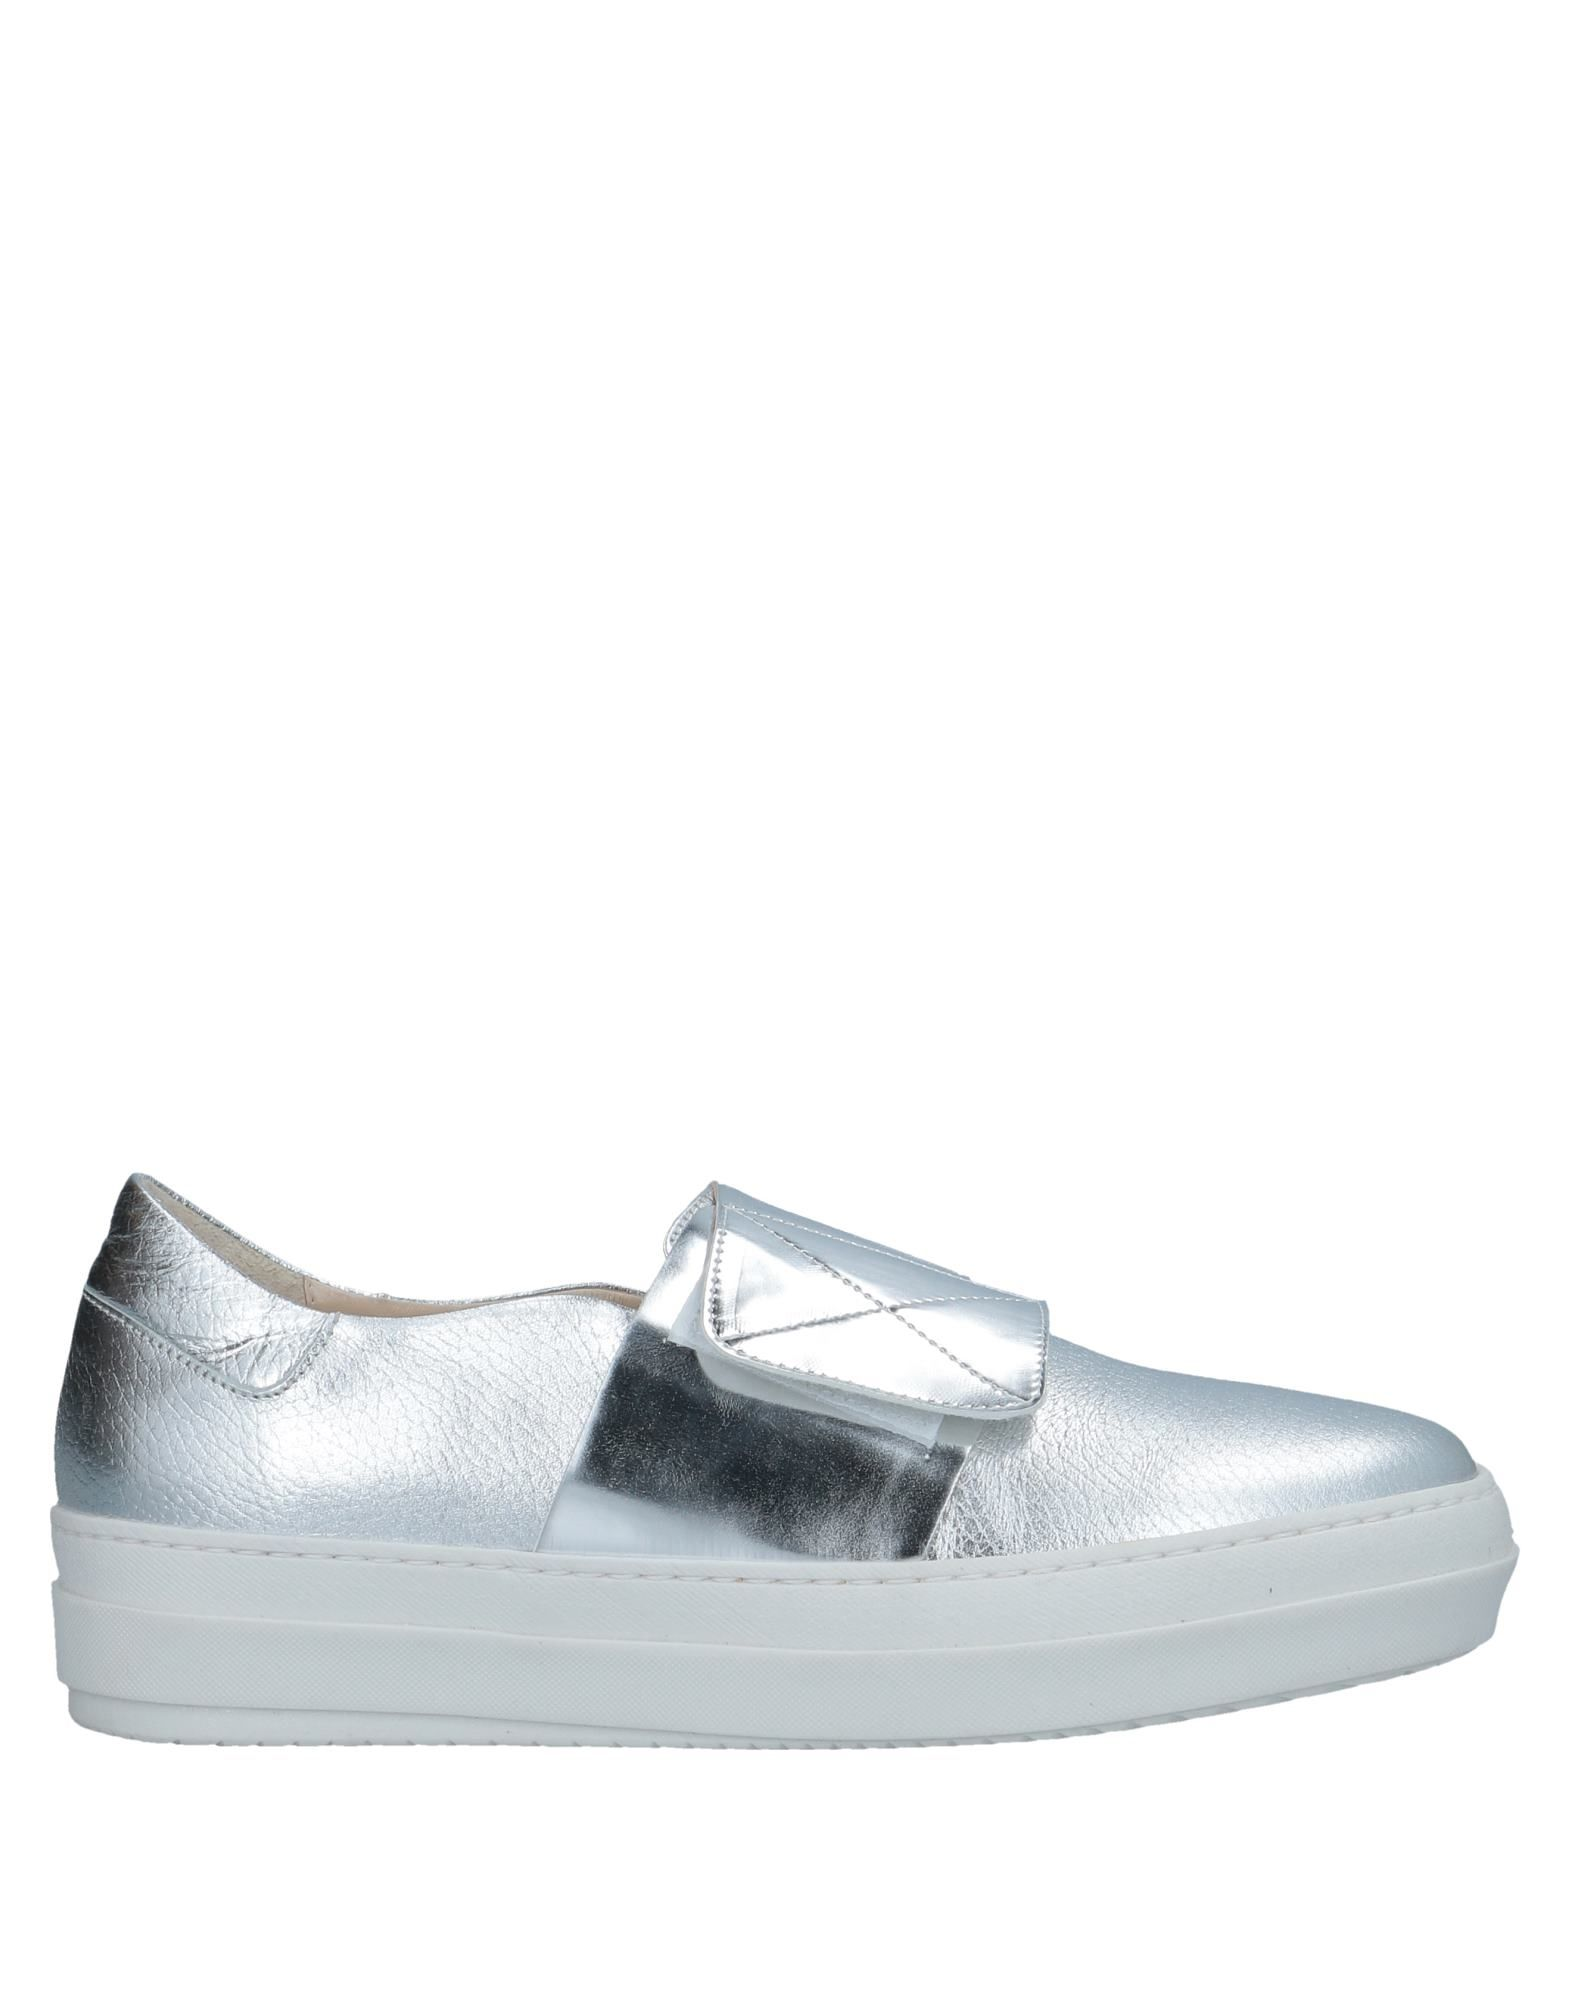 Sneakers Atos Lombardini Donna - 11526847WK